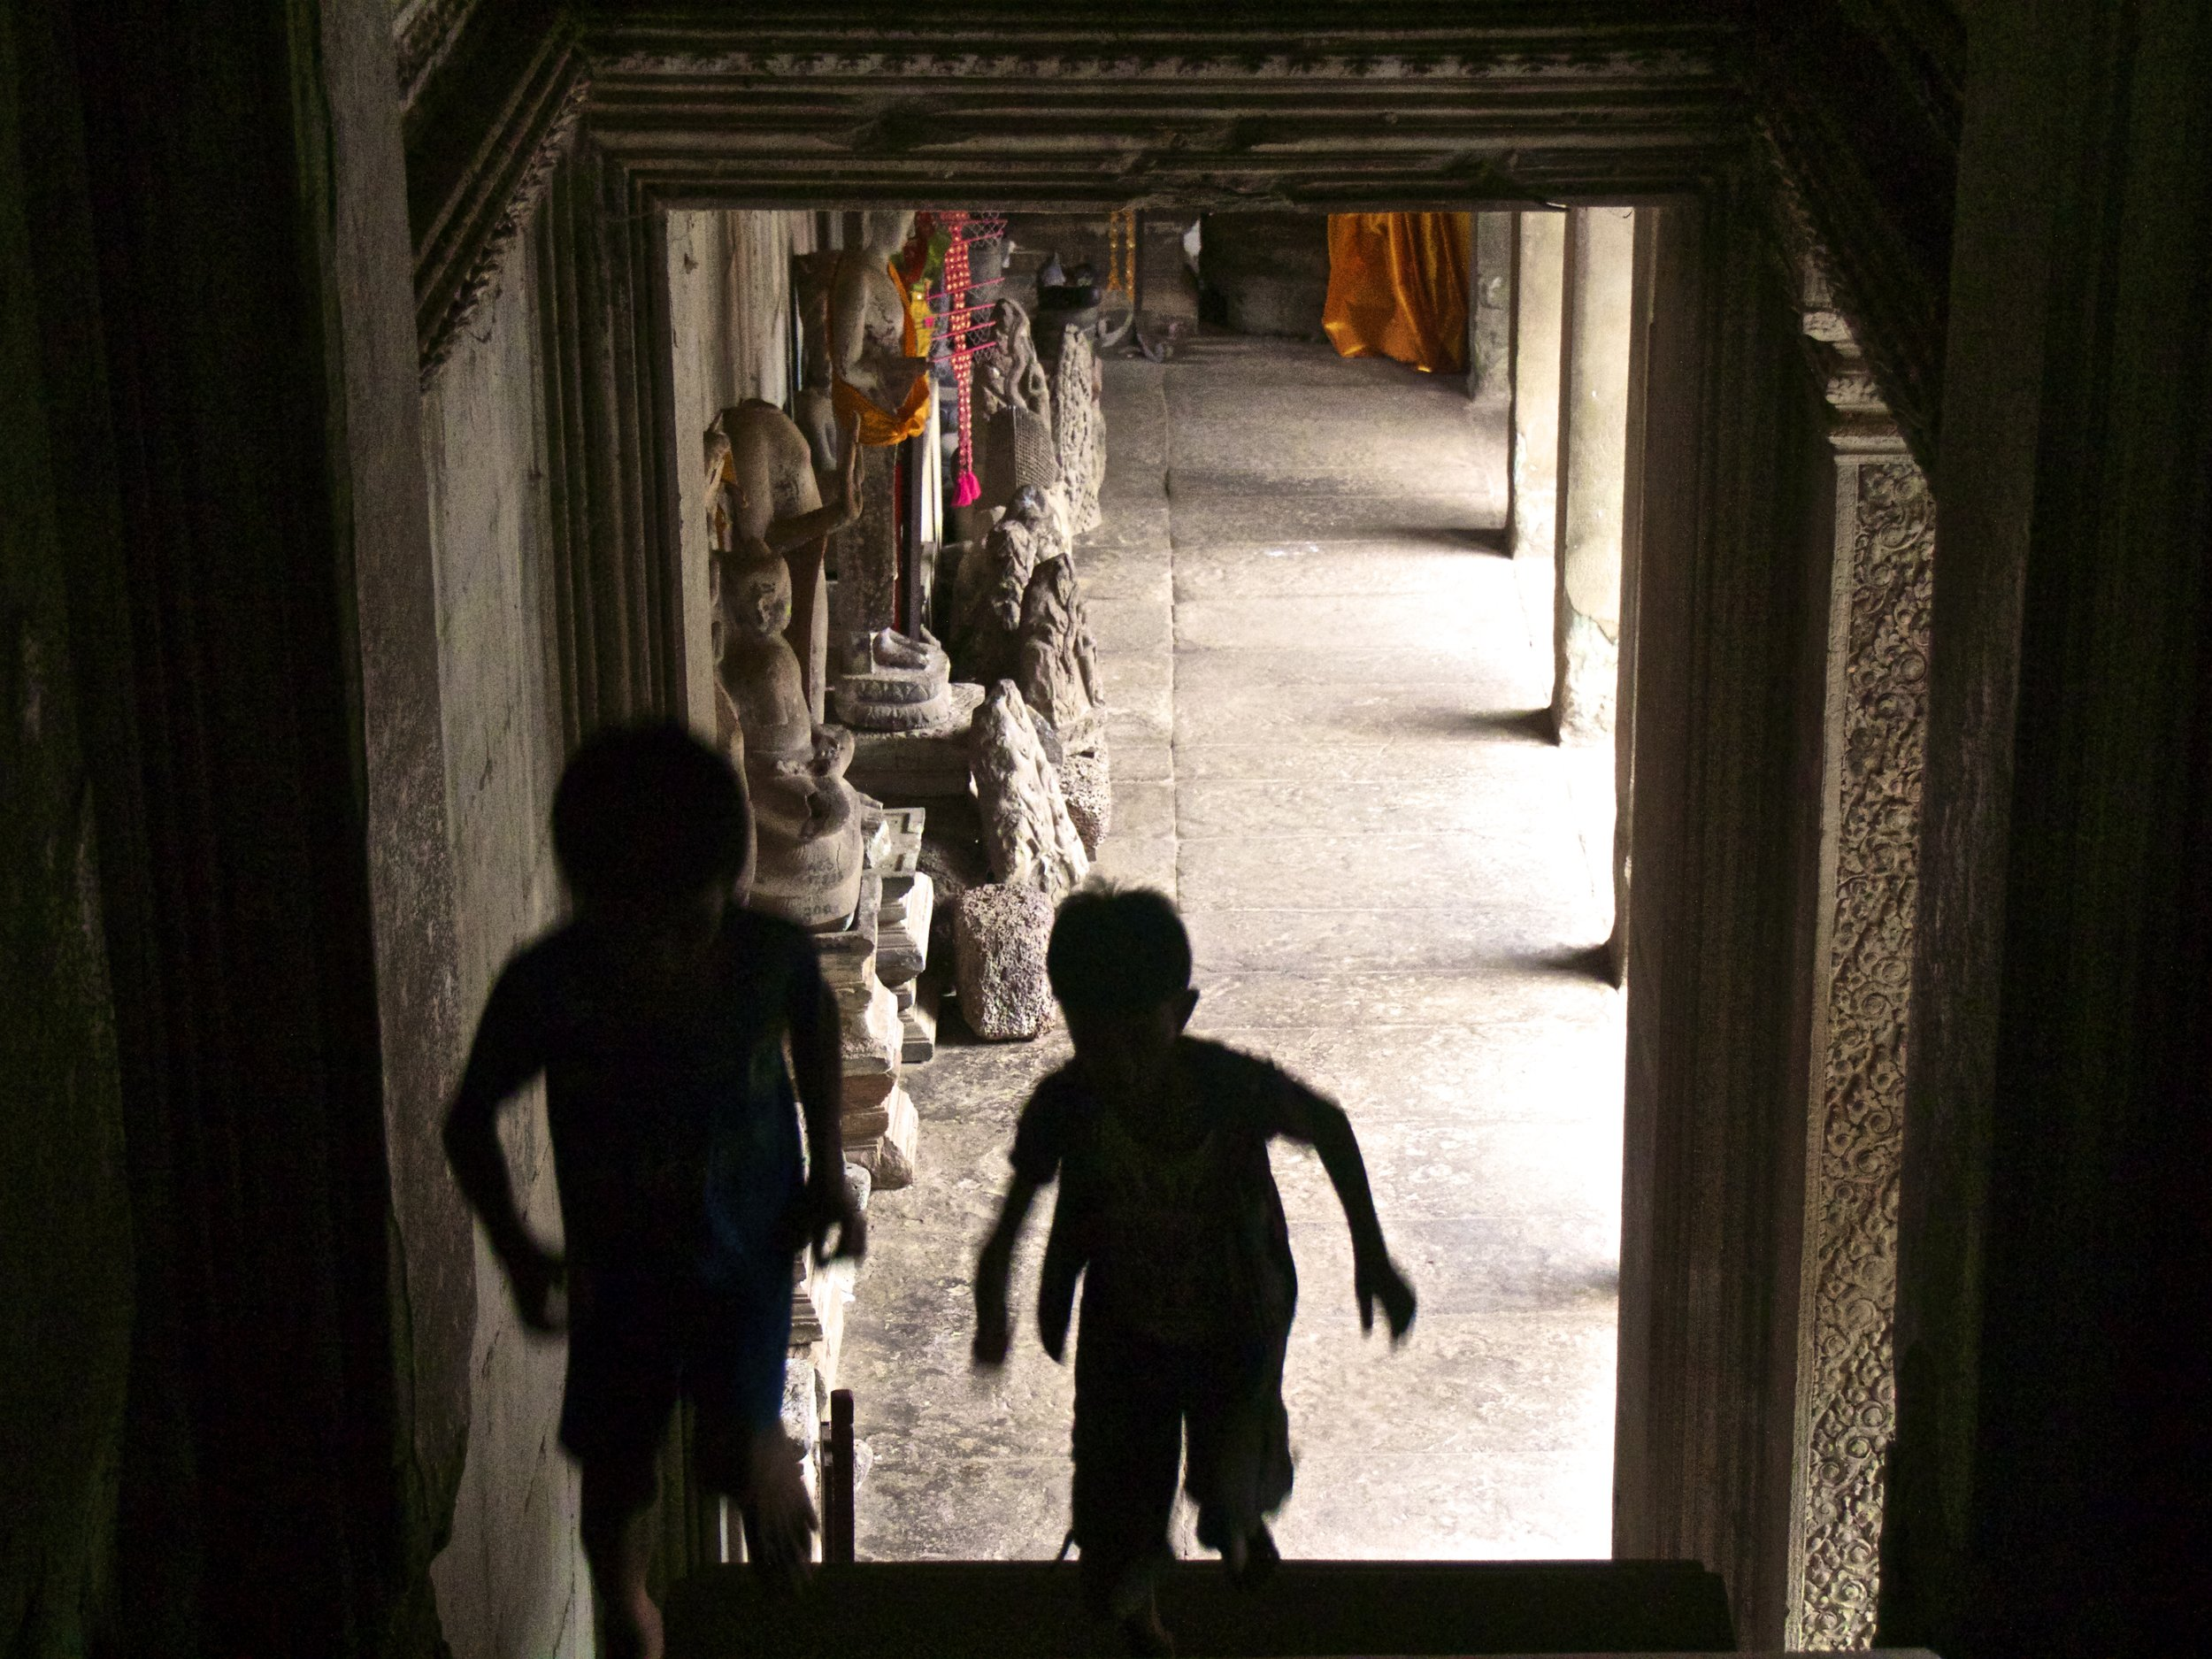 angkor wat siem reap cambodia 5.jpg